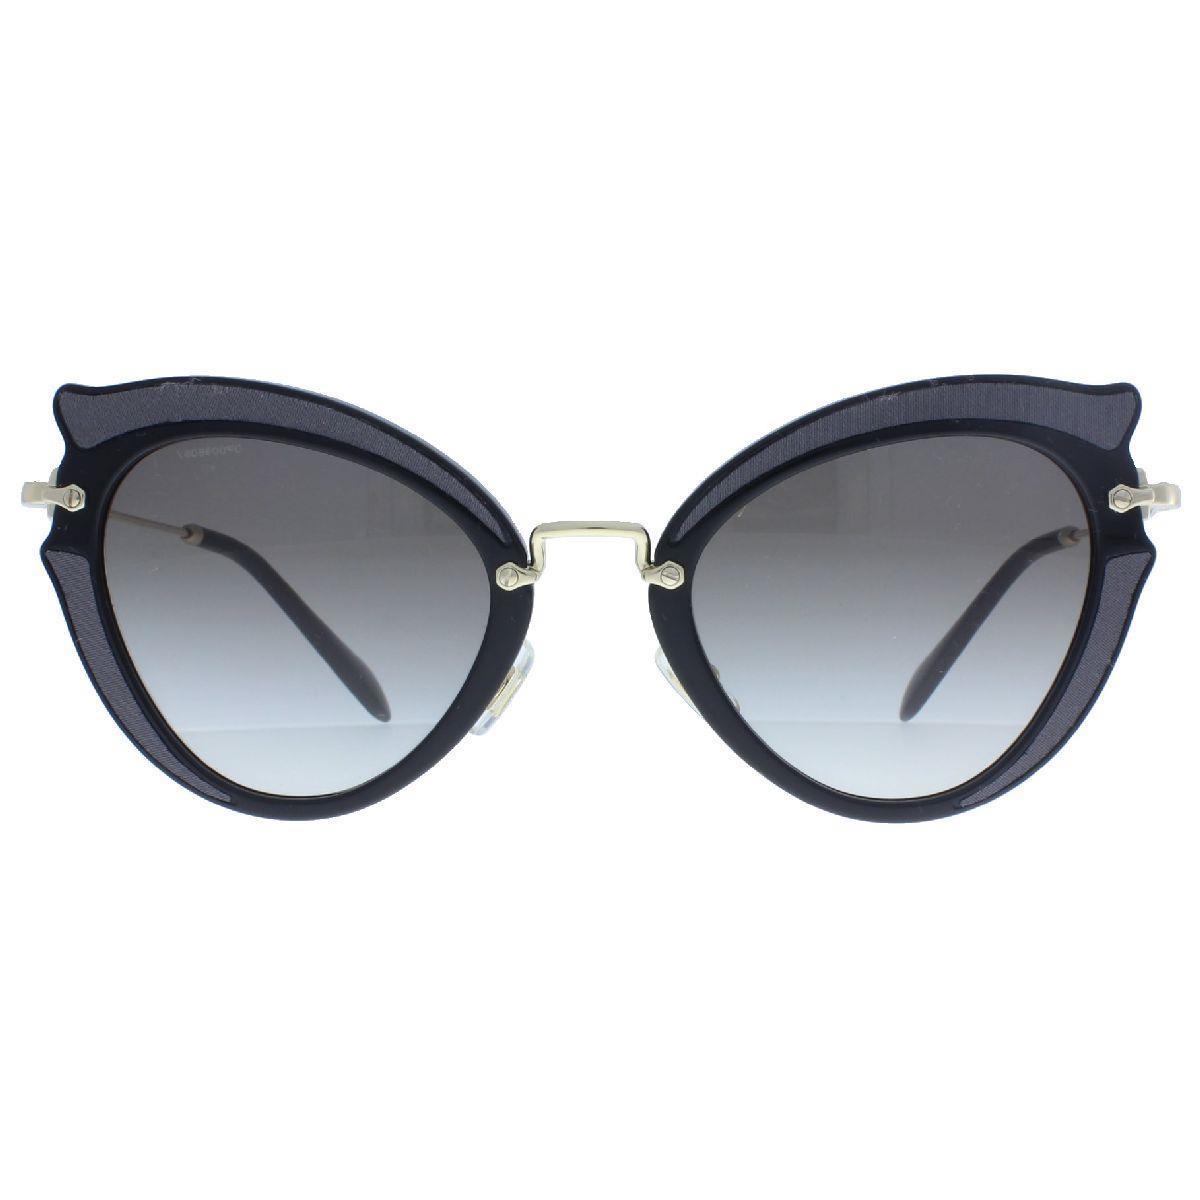 Óculos de Sol Feminino Miu Miu - 0MU 05SS VIE0A752 - 0MU 05SS VIE0A752 - MIU -MIU ddde651cac